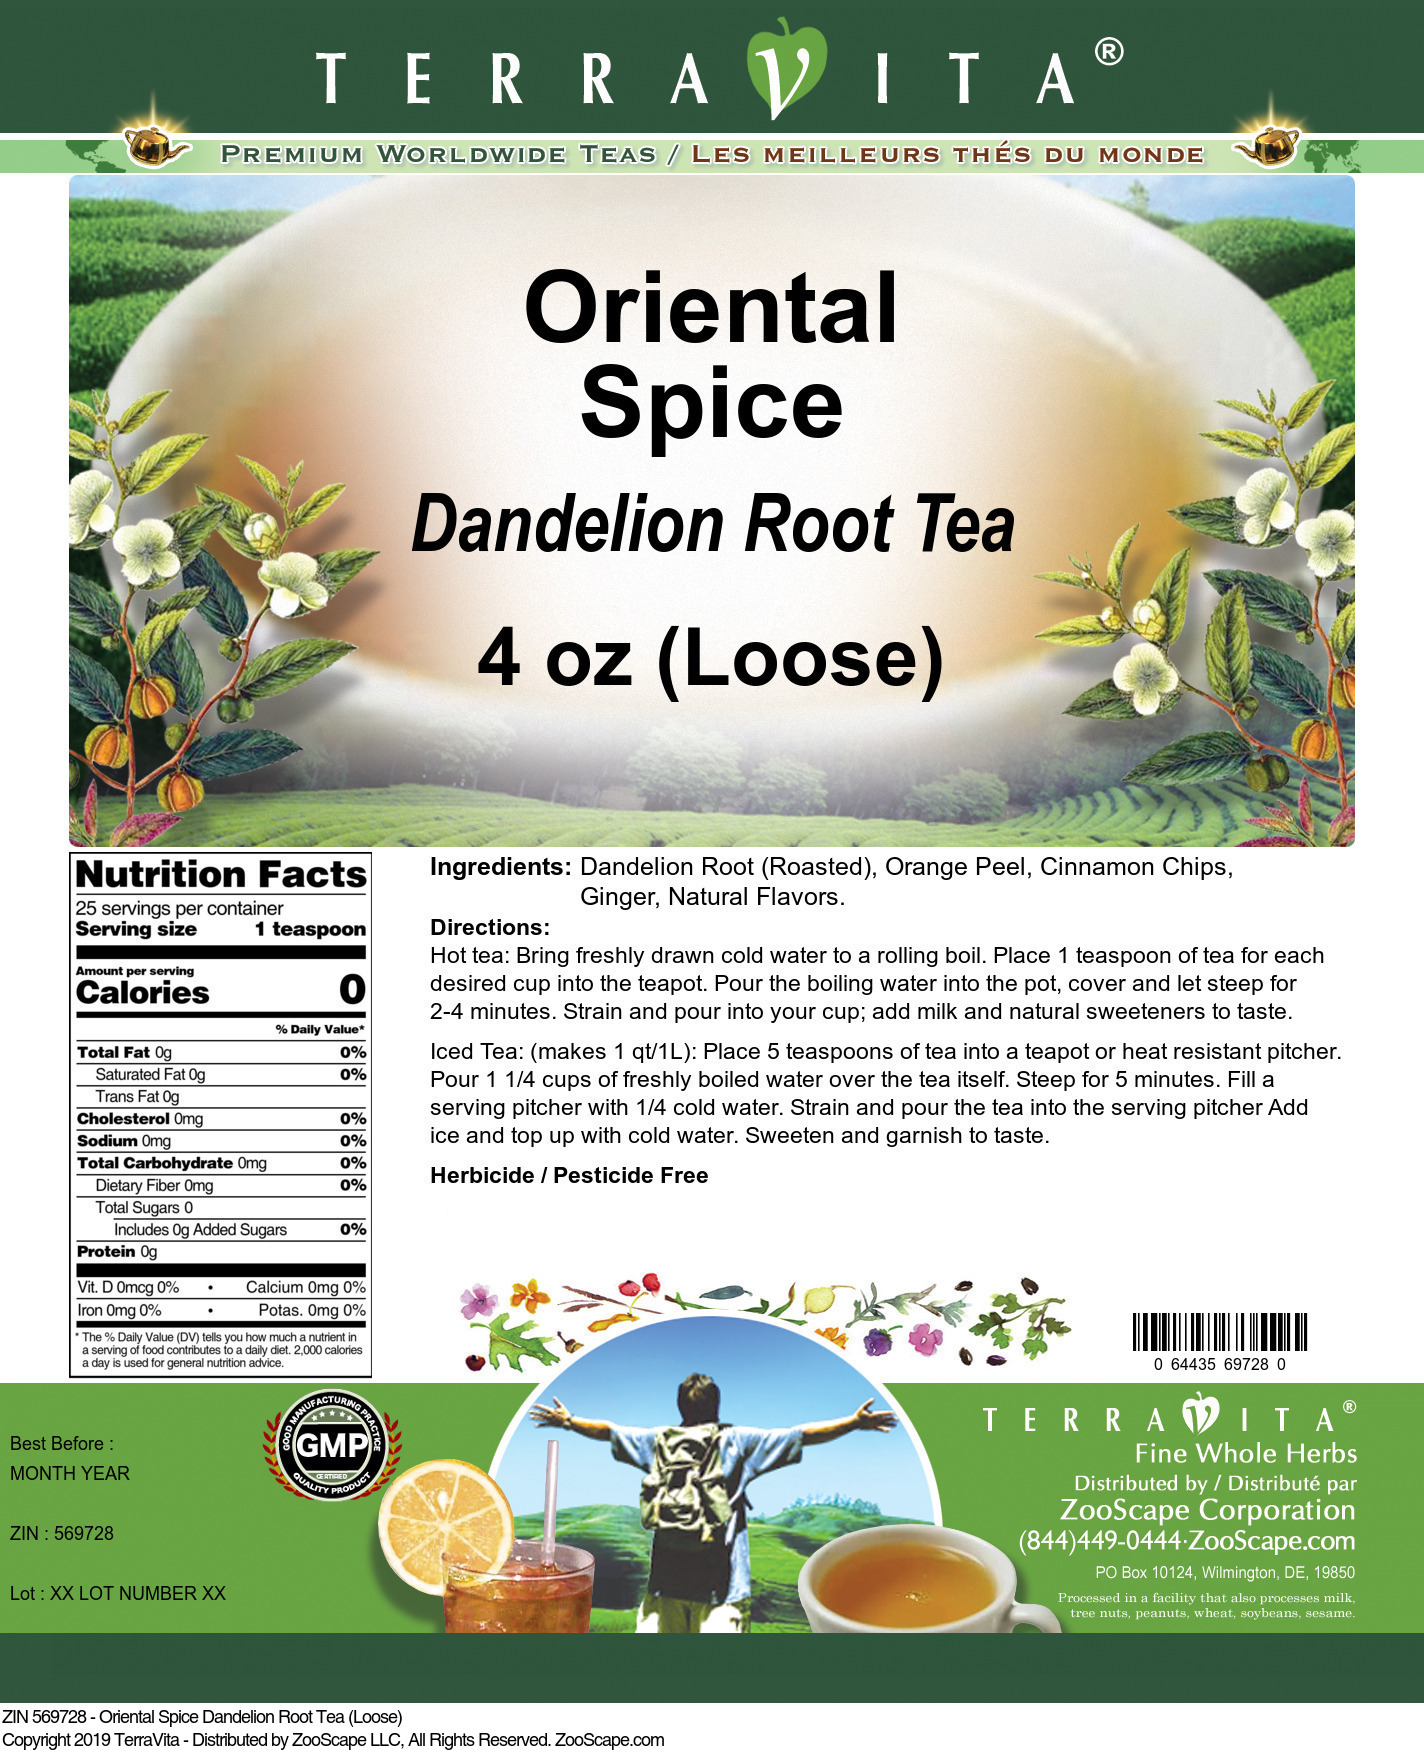 Oriental Spice Dandelion Root Tea (Loose)